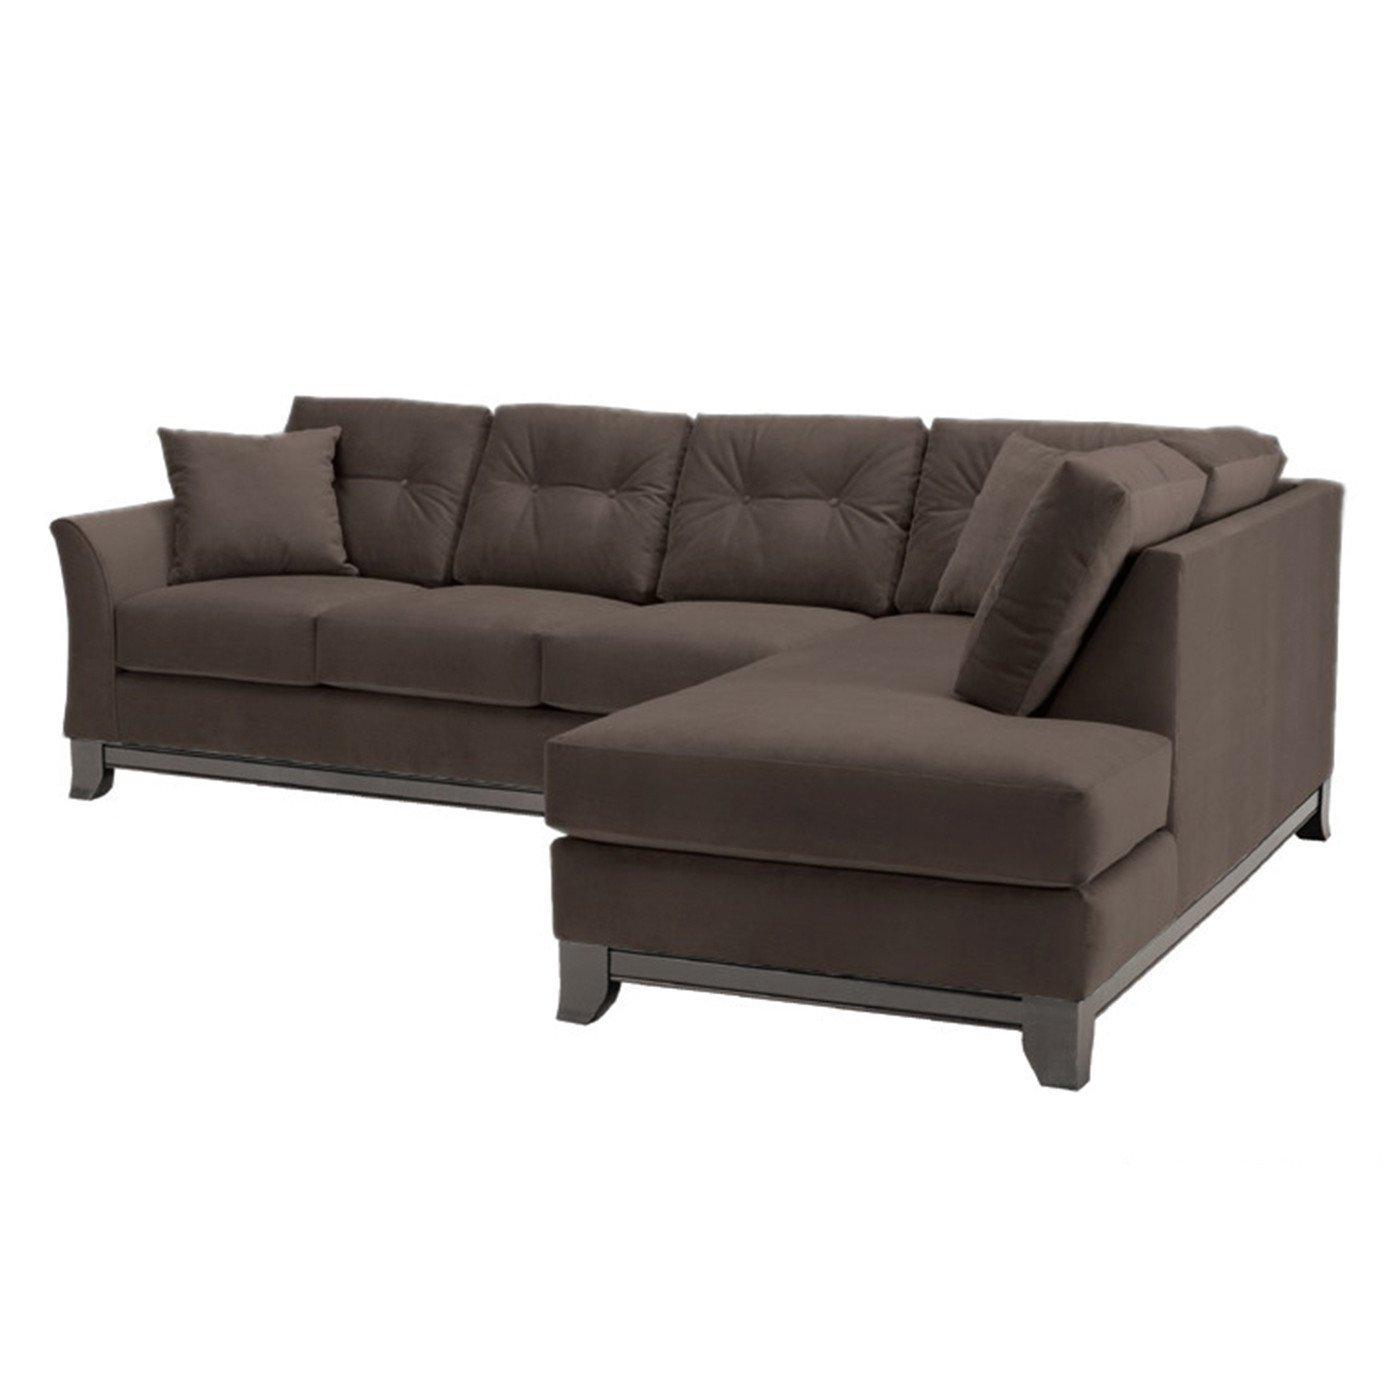 Fantastic Amazon Com Marco 2 Piece Sectional Sofa Charcoal Laf Creativecarmelina Interior Chair Design Creativecarmelinacom